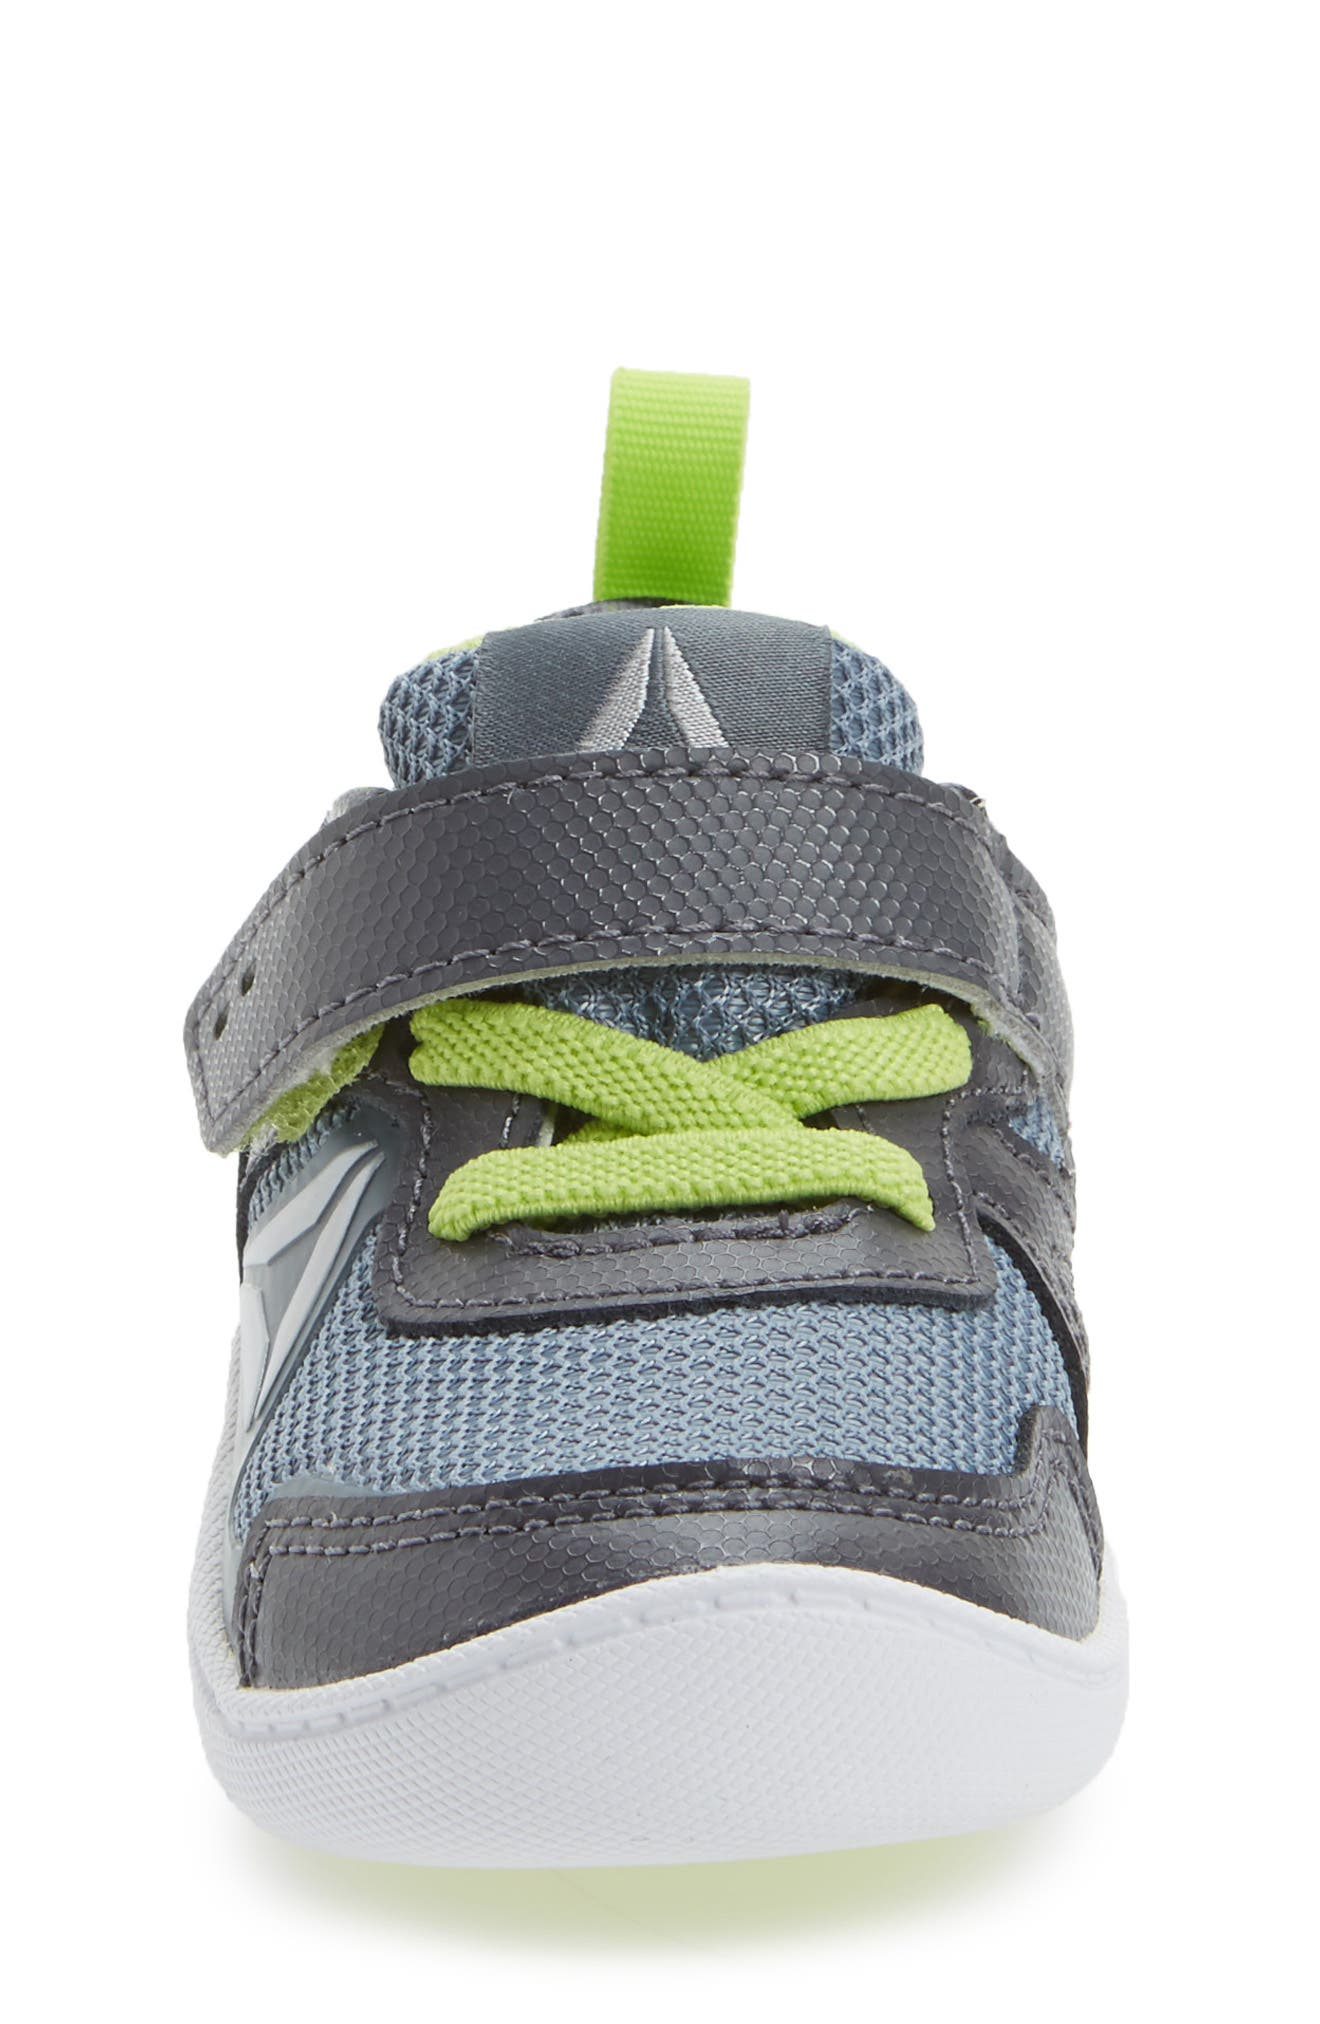 Ventureflex Stride 5.0 Sneaker,                             Alternate thumbnail 4, color,                             020